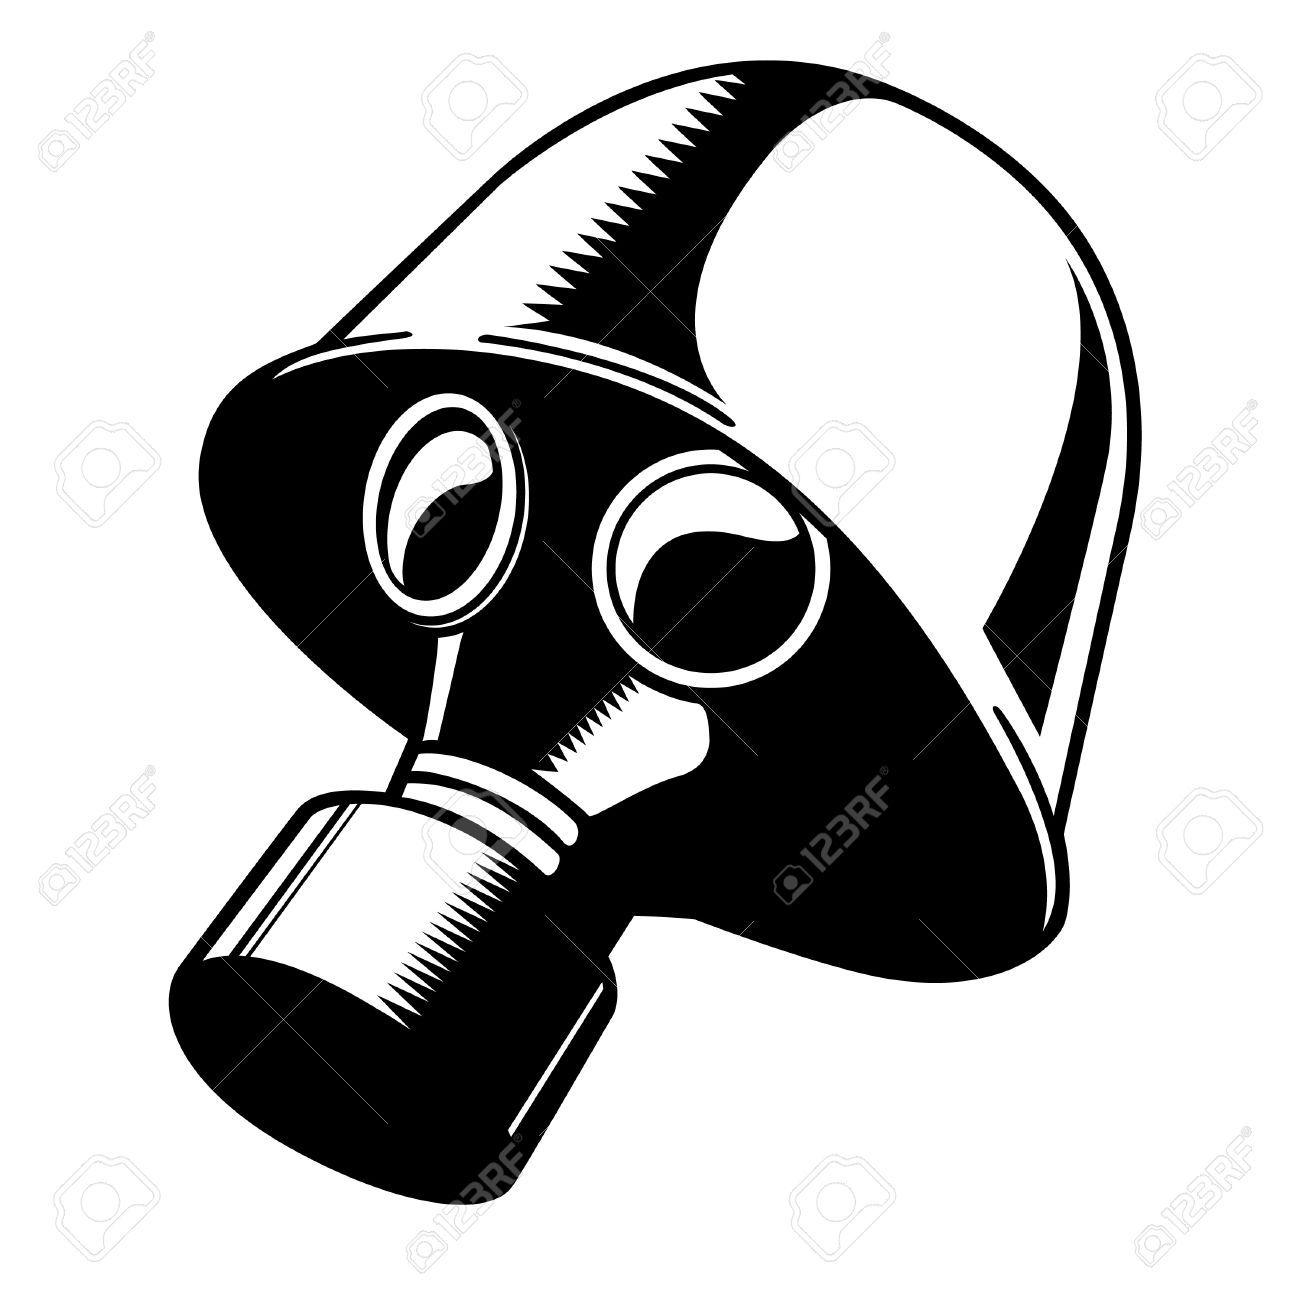 image result for gas mask cartoon cartoons 4 pinterest cartoon rh pinterest com gas mask cartoon pic gas mask cartoon drawing